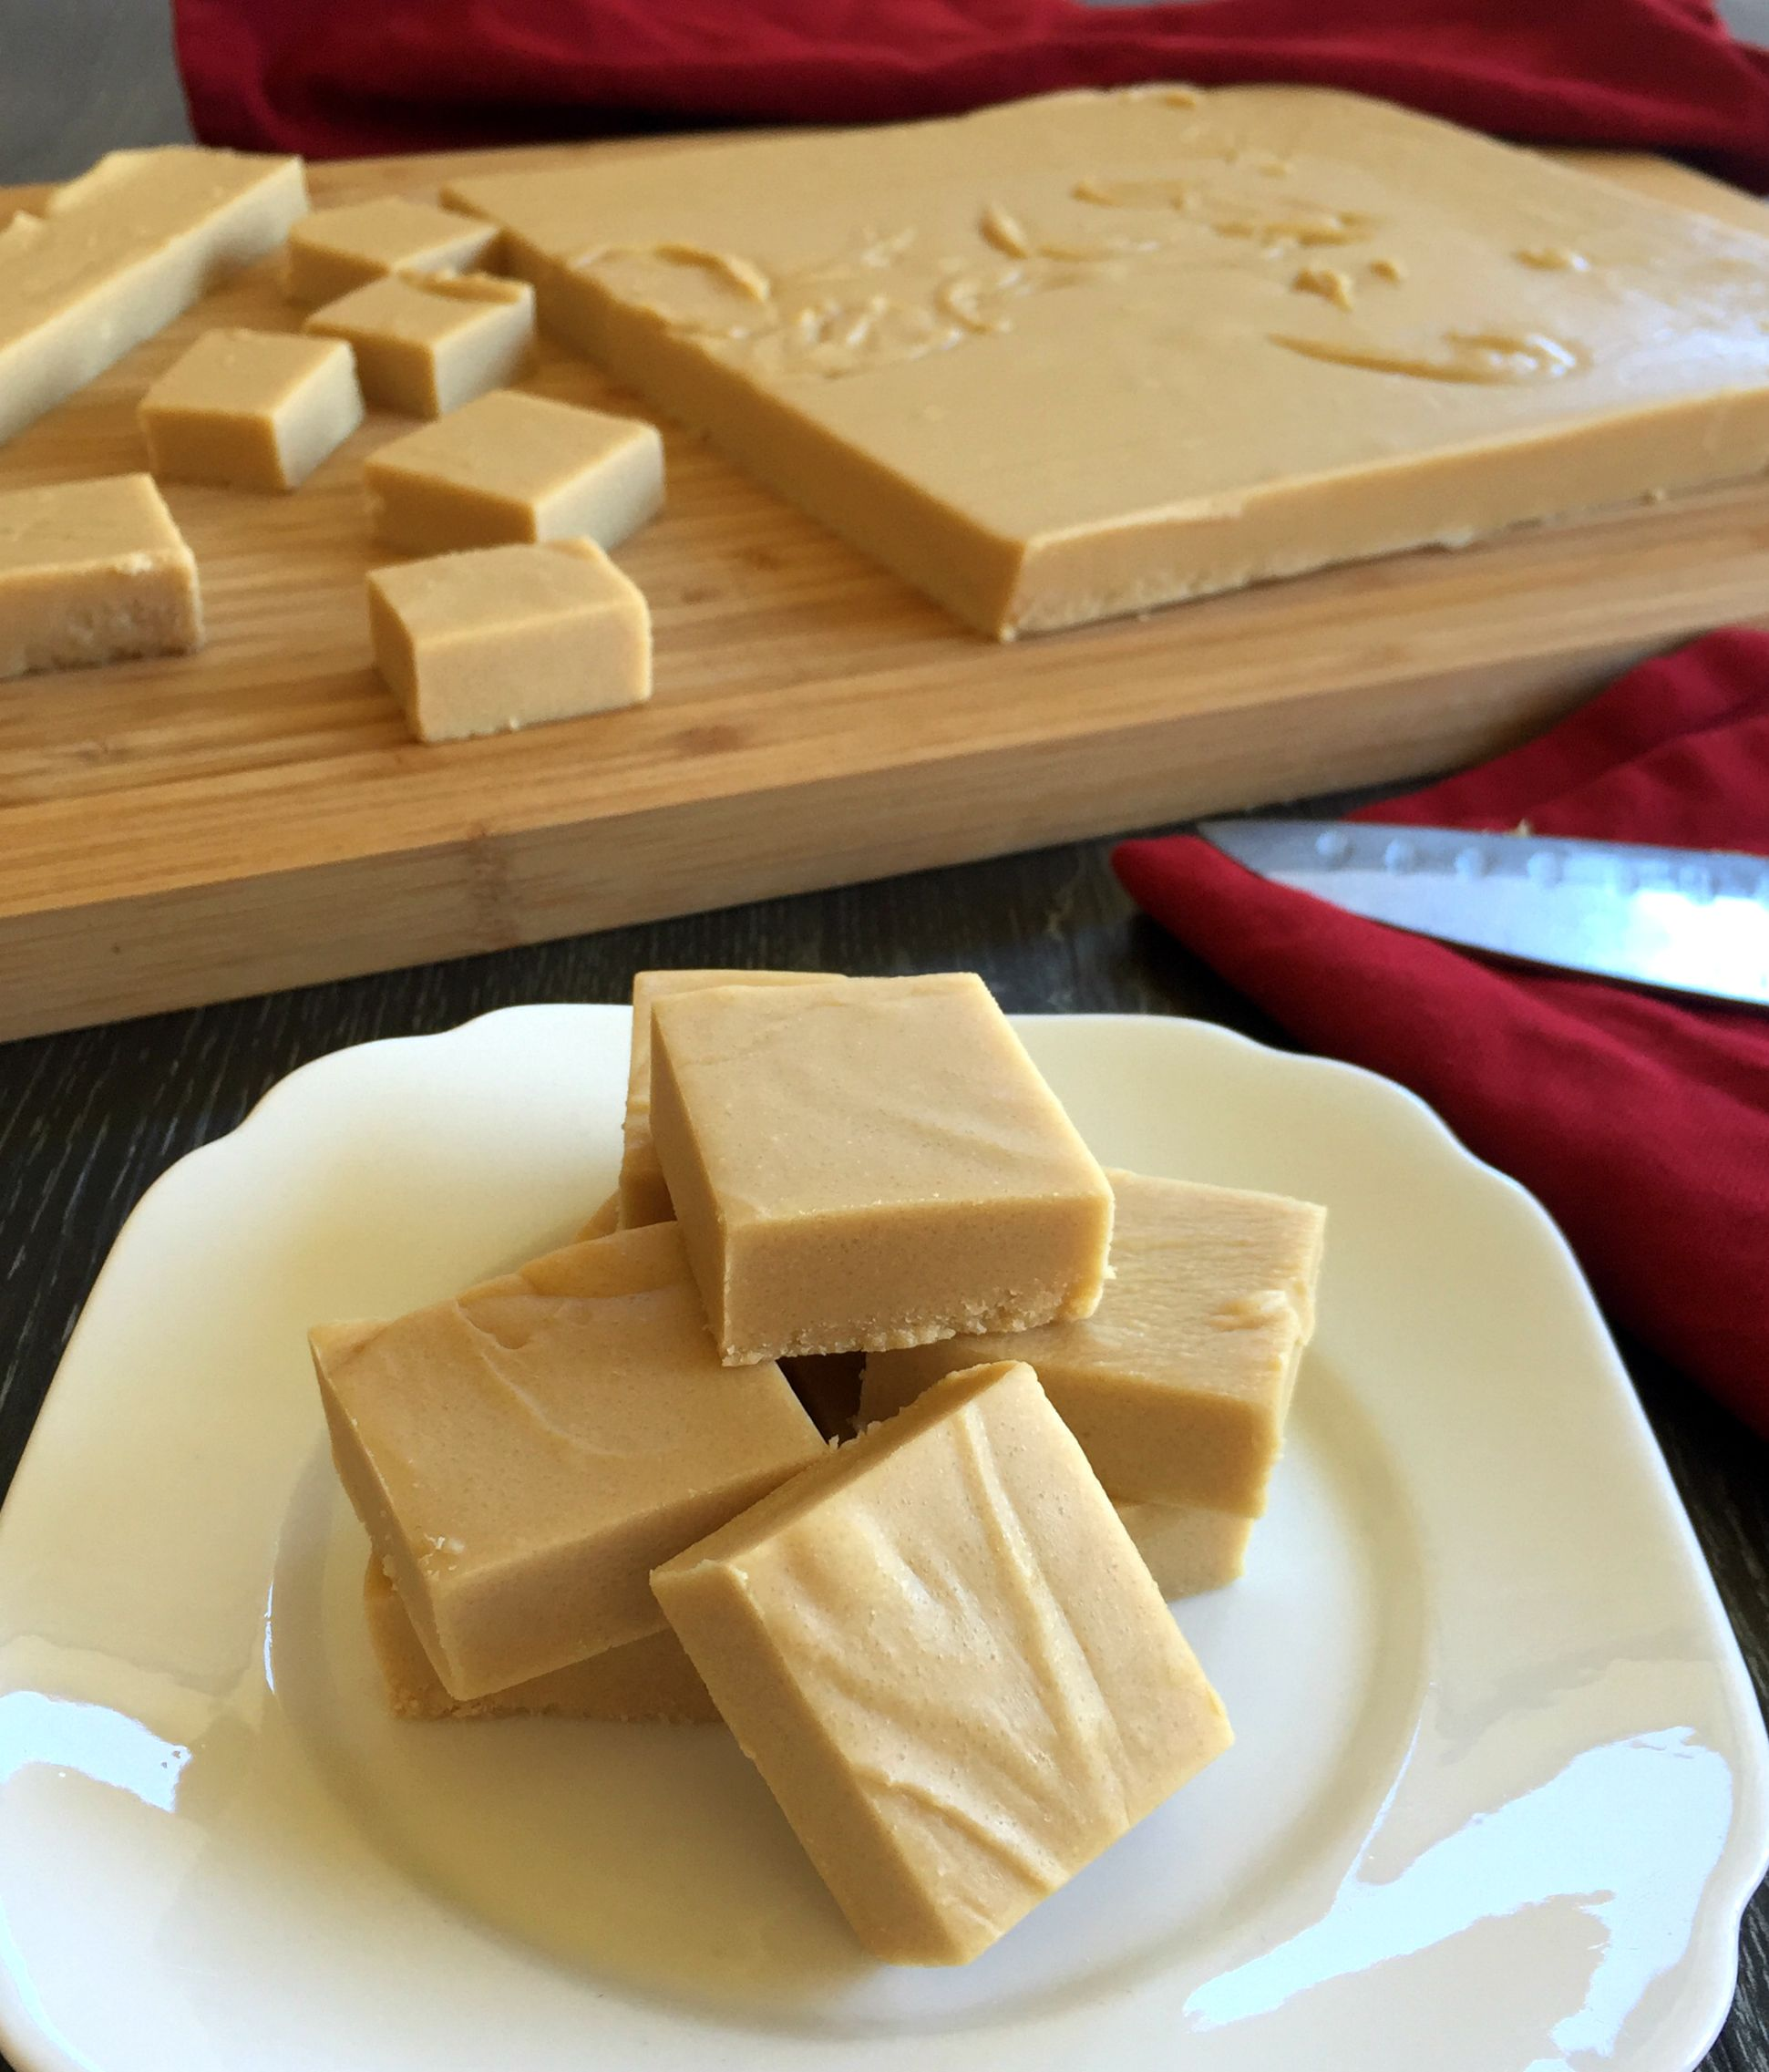 Caramel White Chocolate Microwave Fudge Recipe Microwave Fudge White Chocolate Fudge Recipes White Chocolate Recipes